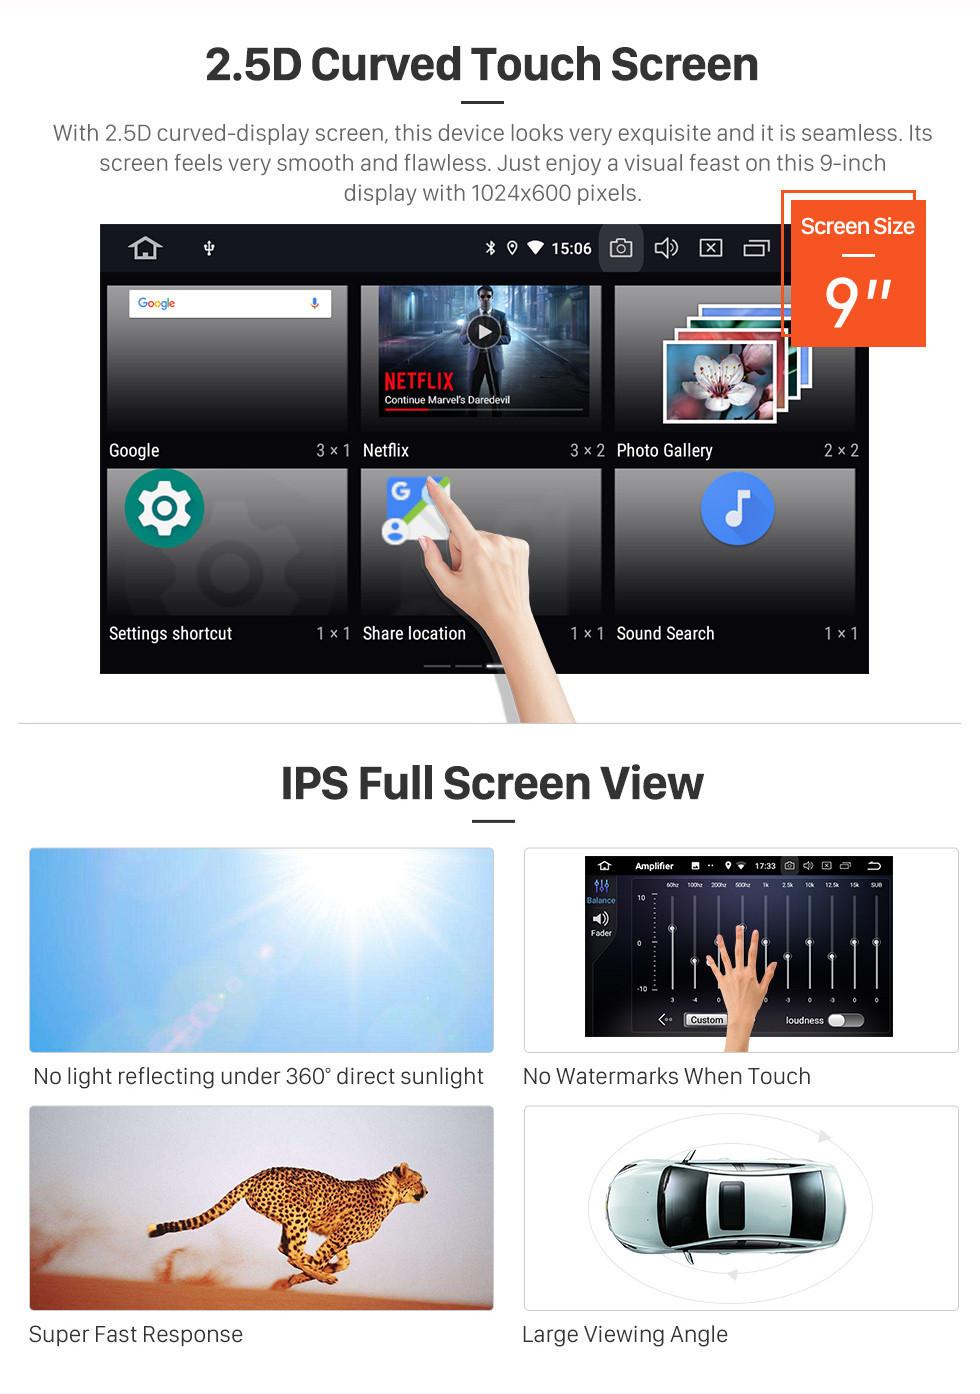 Seicane 2007-2011 Toyota Innova Manual A/C Android 10.0 9 inch GPS Navigation Radio Bluetooth HD Touchscreen USB Carplay Music support TPMS DAB+ 1080P Video